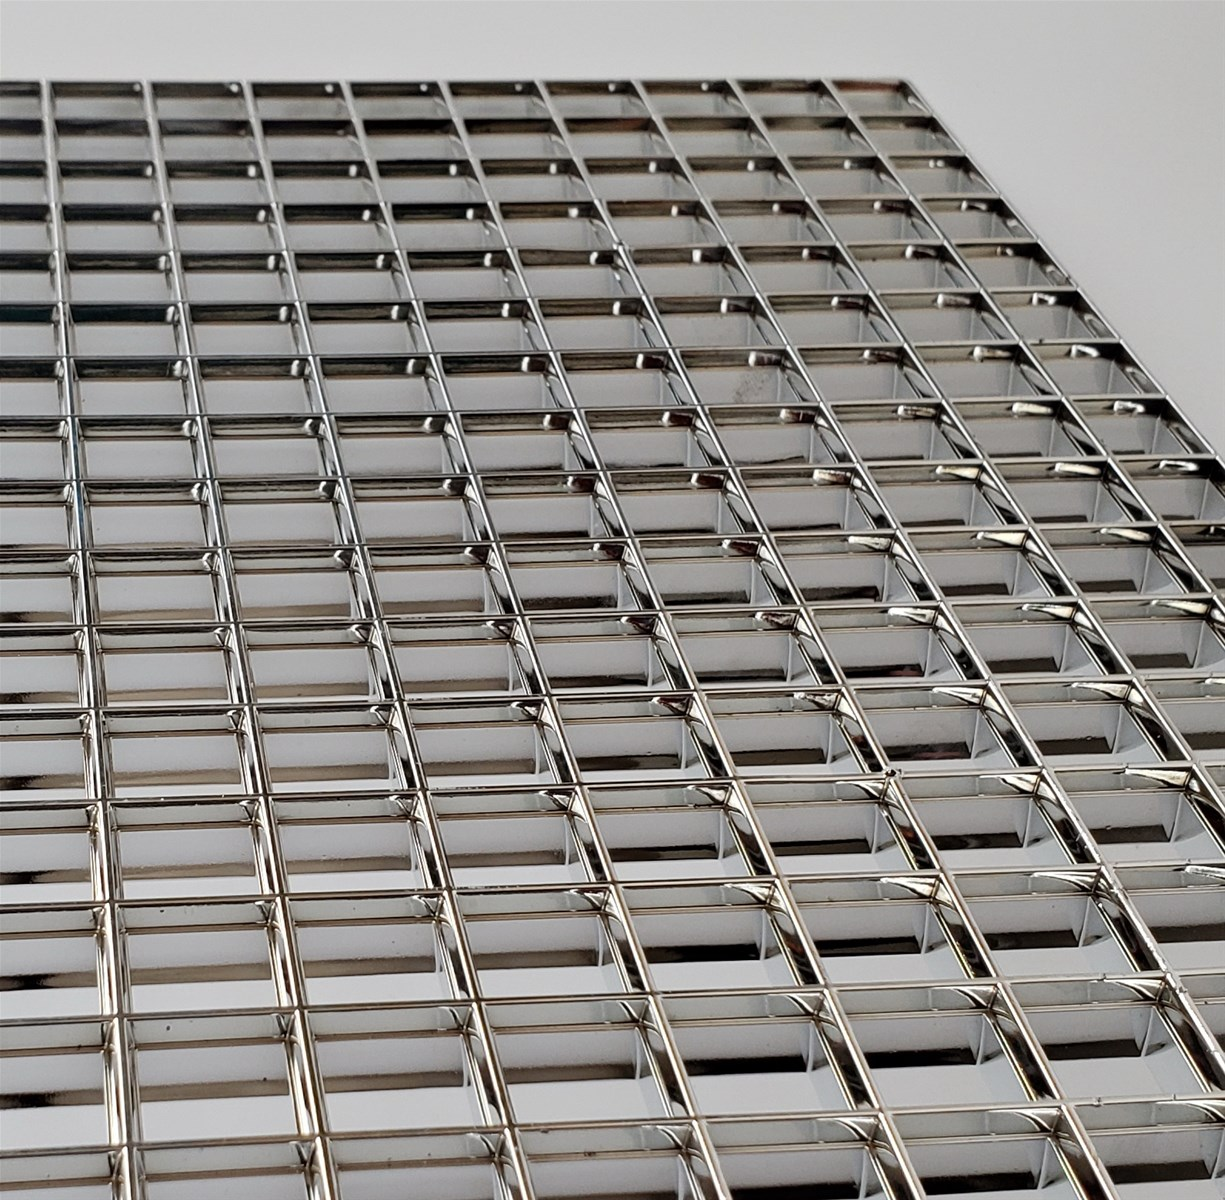 Plastic Chrome Eggcrate Panel Vacuum Plating Egg Crate Metalized Silver AntiDazzle NonGlare Grille